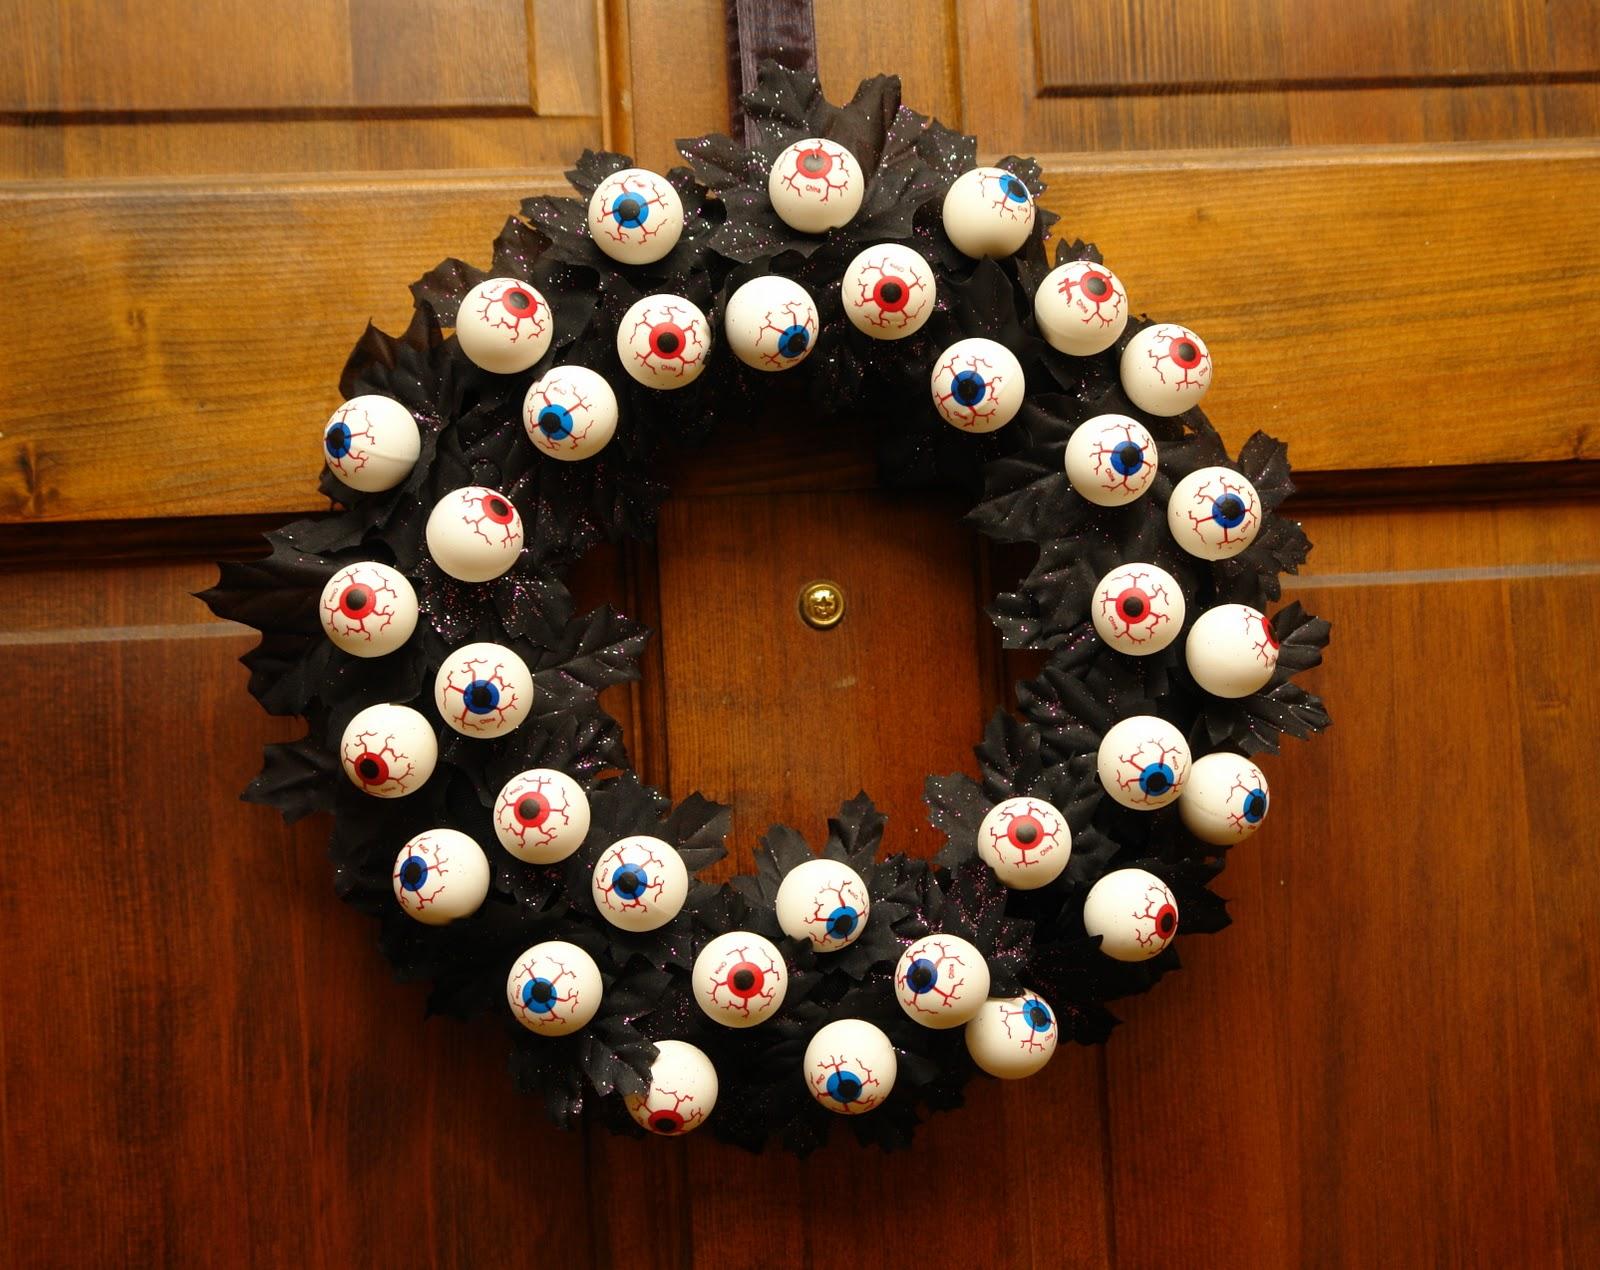 Eyeball christmas ornaments - Eyeball Christmas Ornaments 15